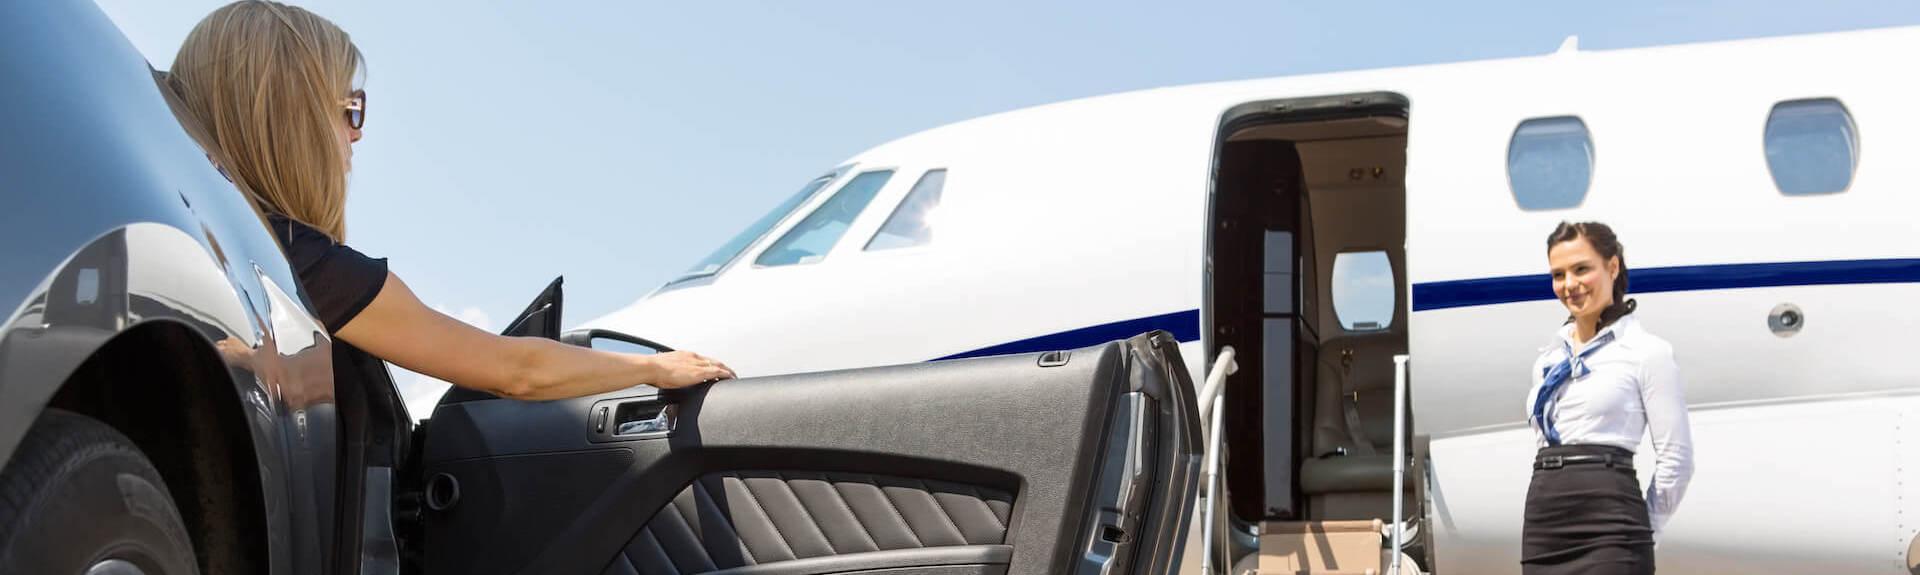 Orlando MCO Airport Limo Service